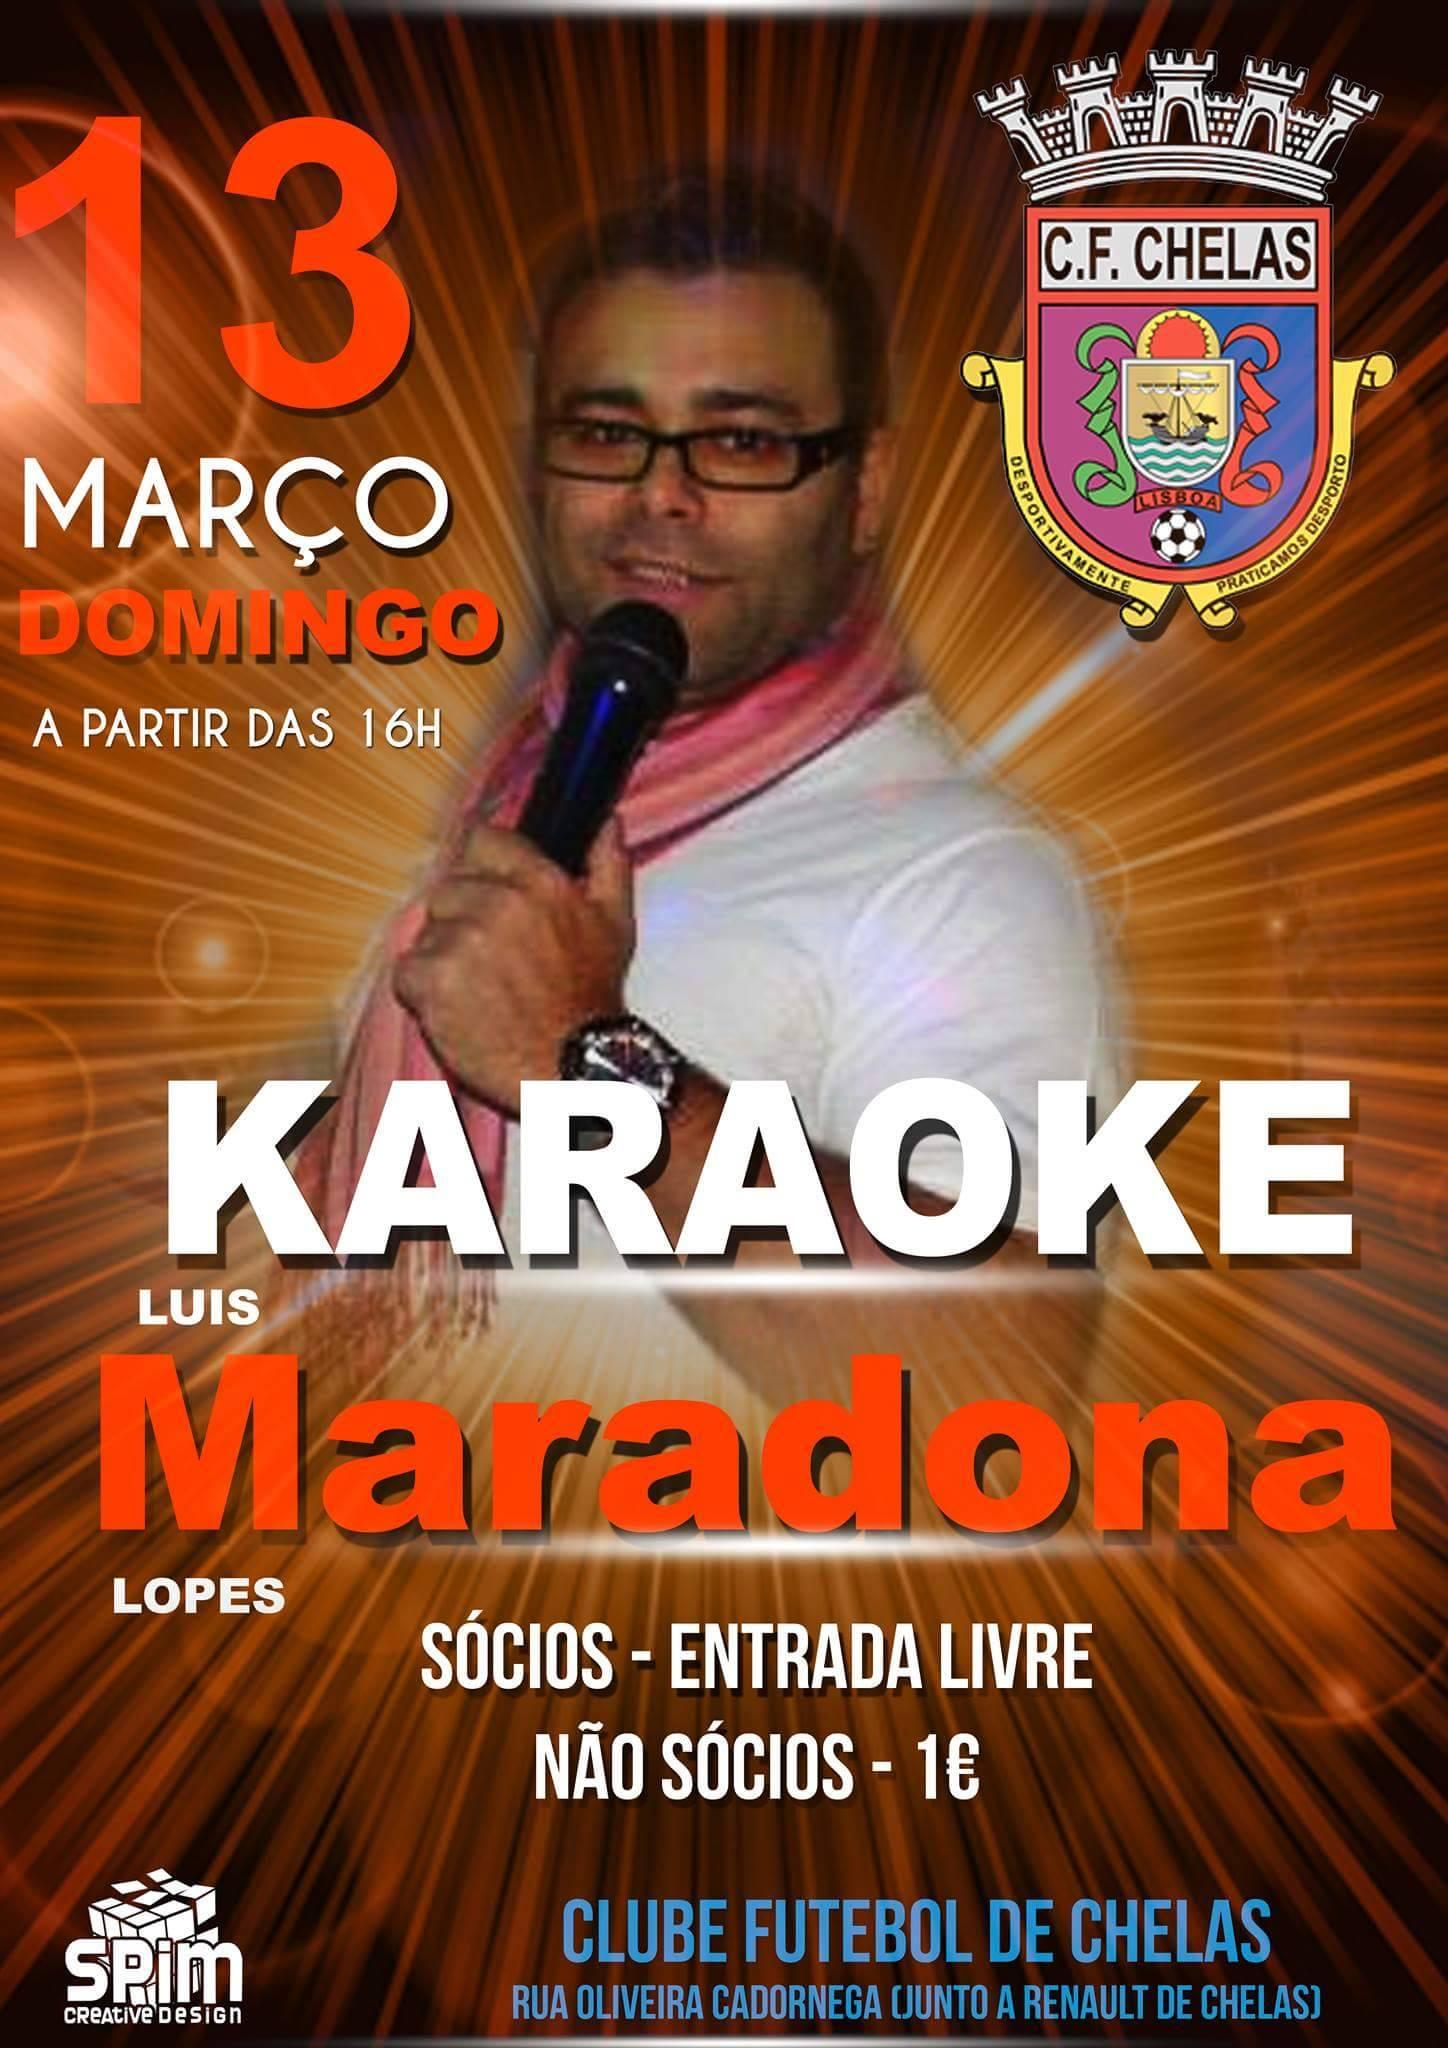 Karaoke 13-4-16